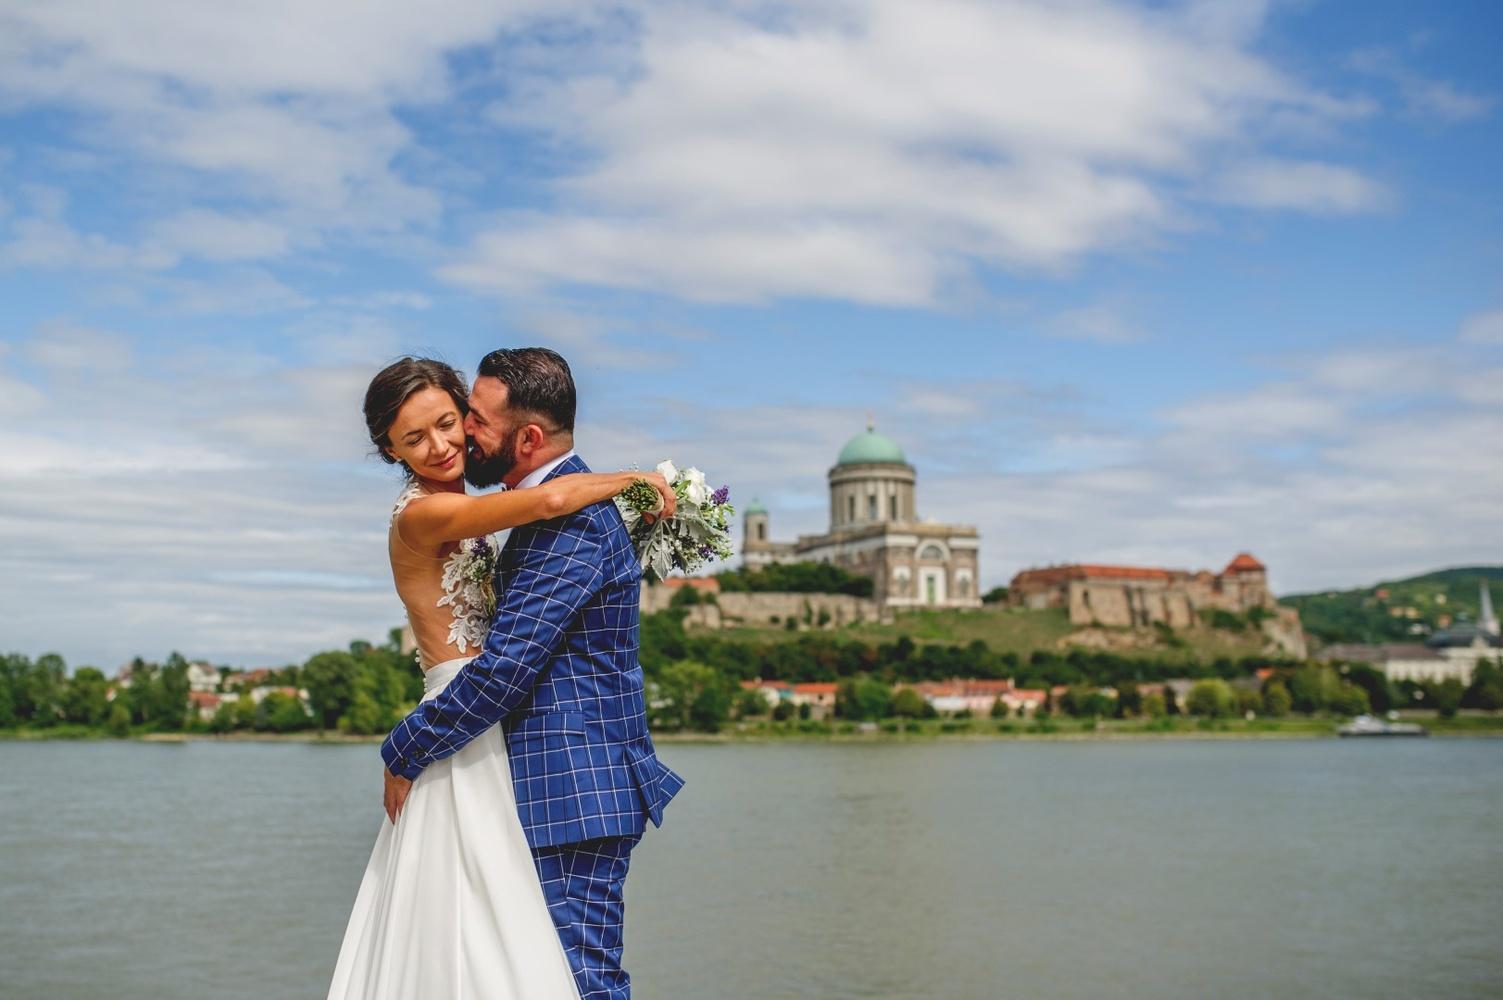 http://www.fotoz.sk/images/gallery-10/normal/eskuvoi-fotozas_svadobne-fotenie_896.jpg